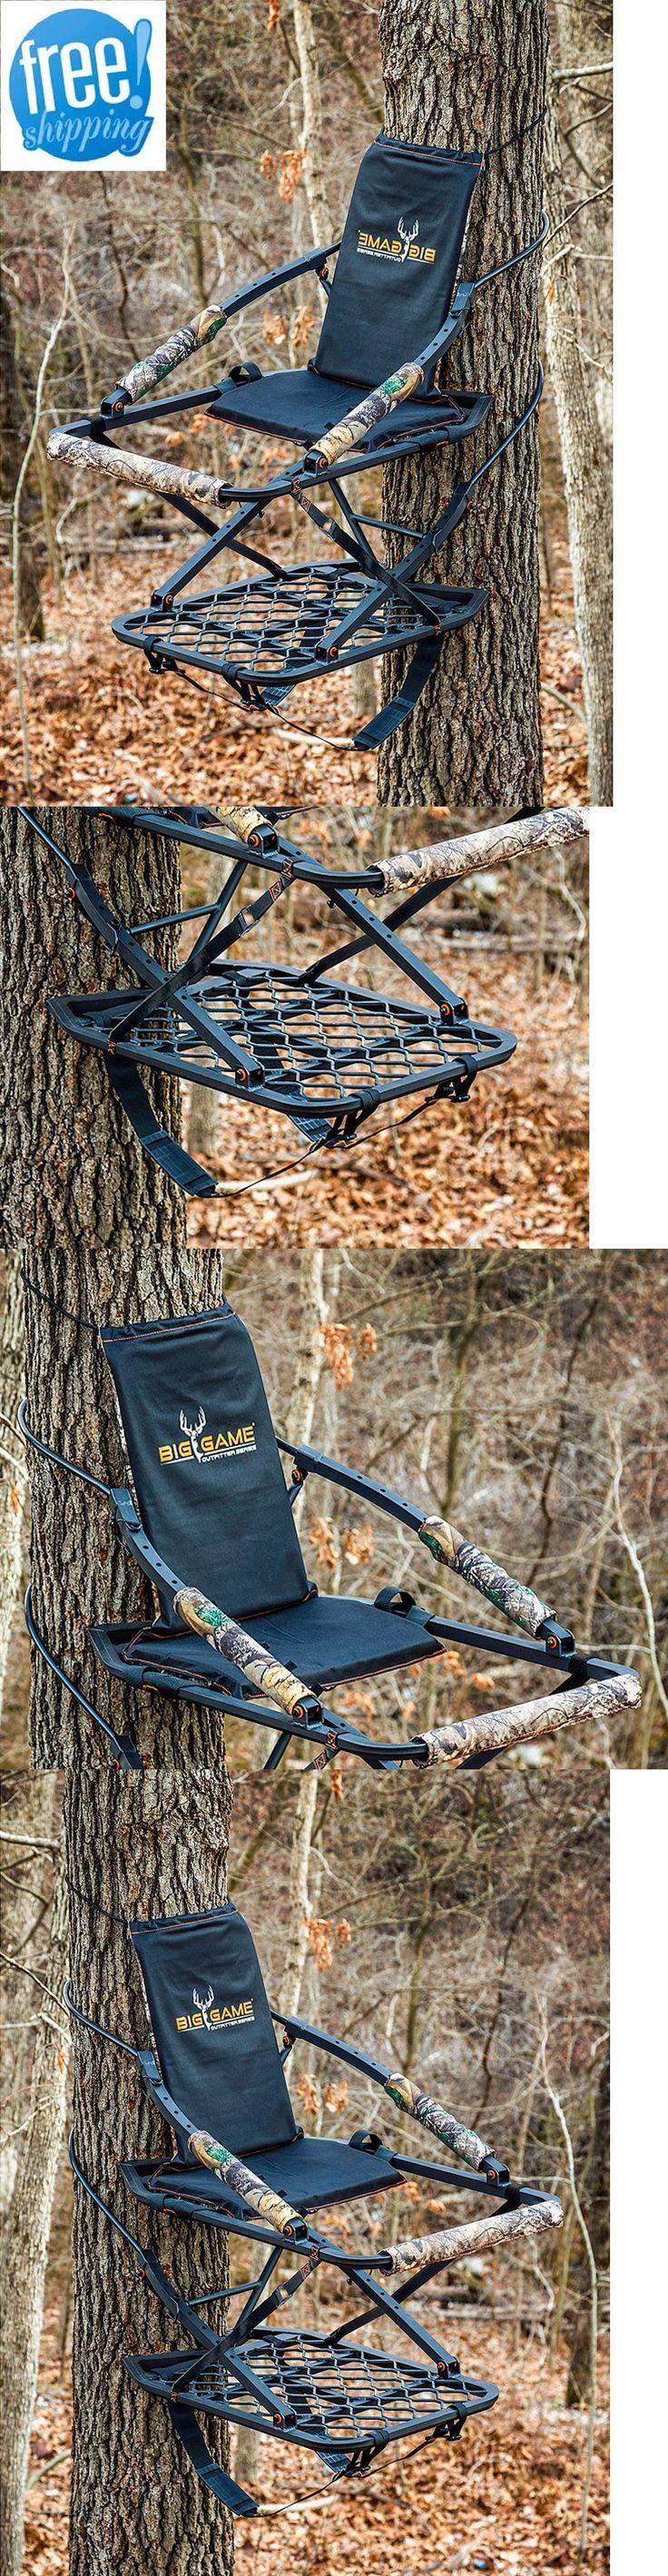 Best 20+ Tree stand hunting ideas on Pinterest | Log wood ...